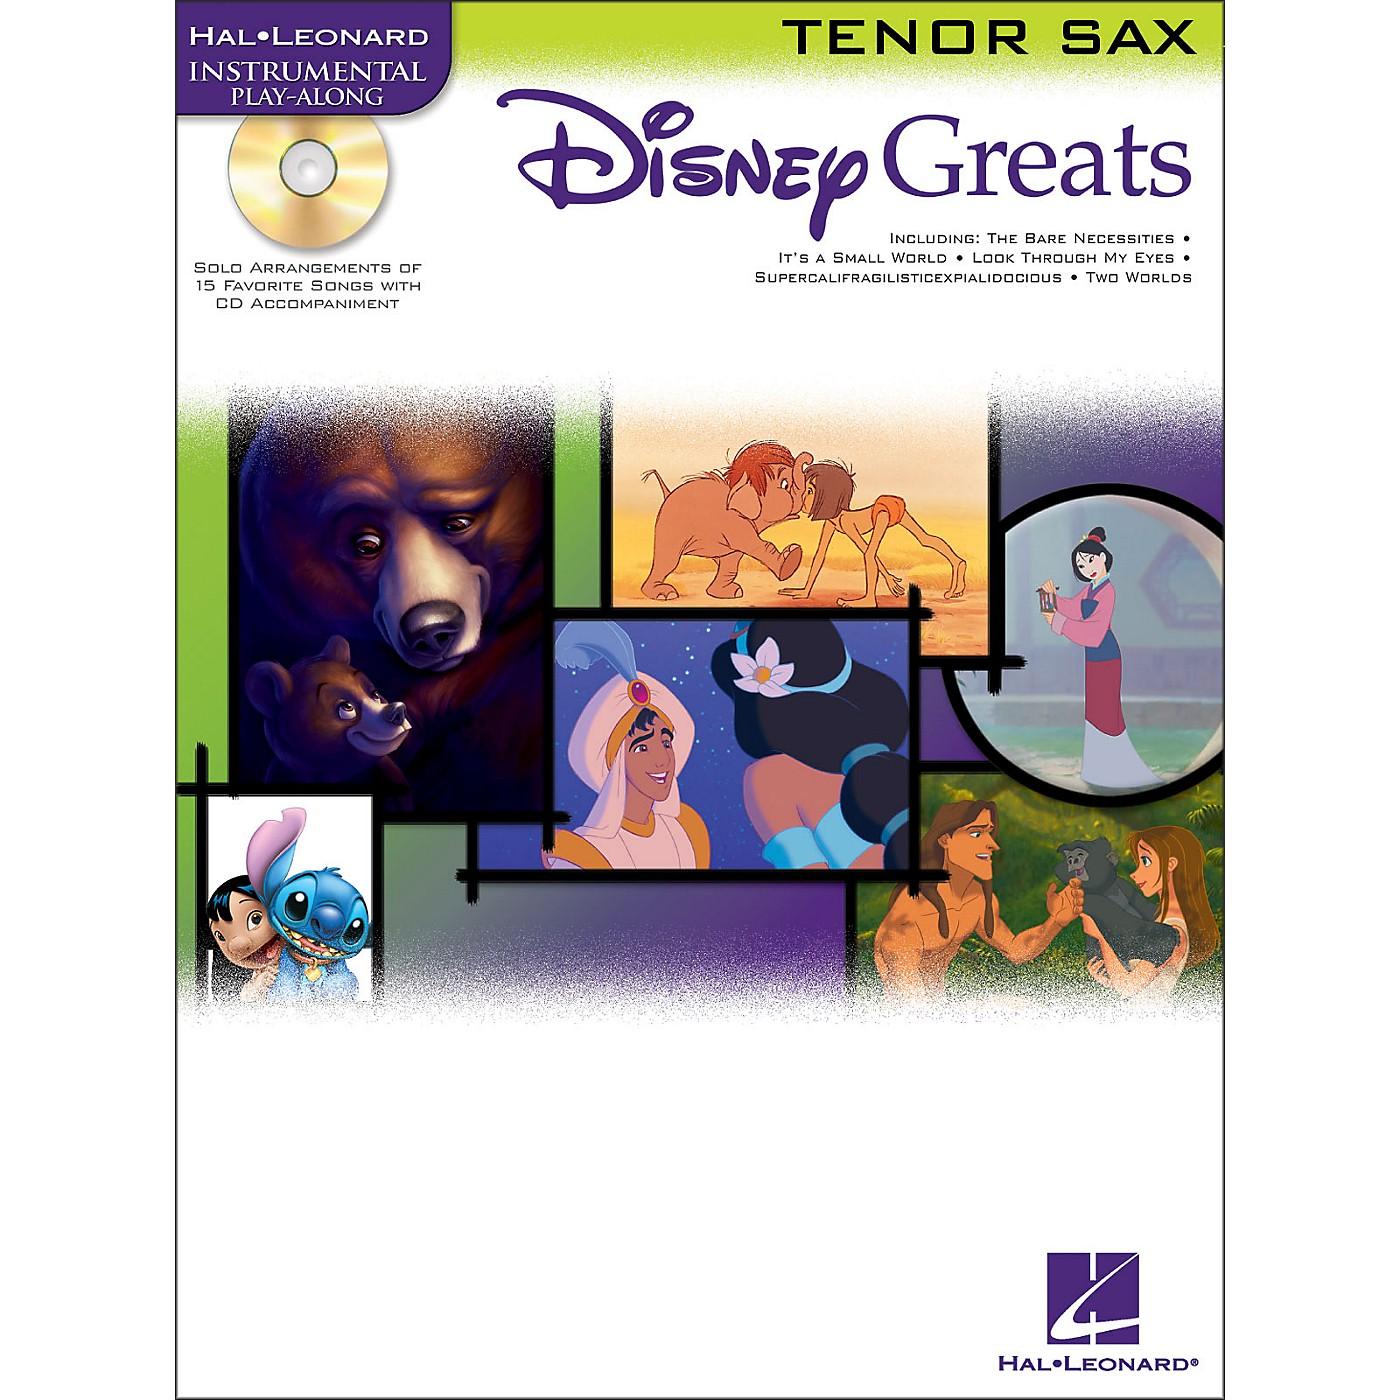 Hal Leonard Disney Greats for Tenor Sax Book/CD Instrumental Play-Along thumbnail